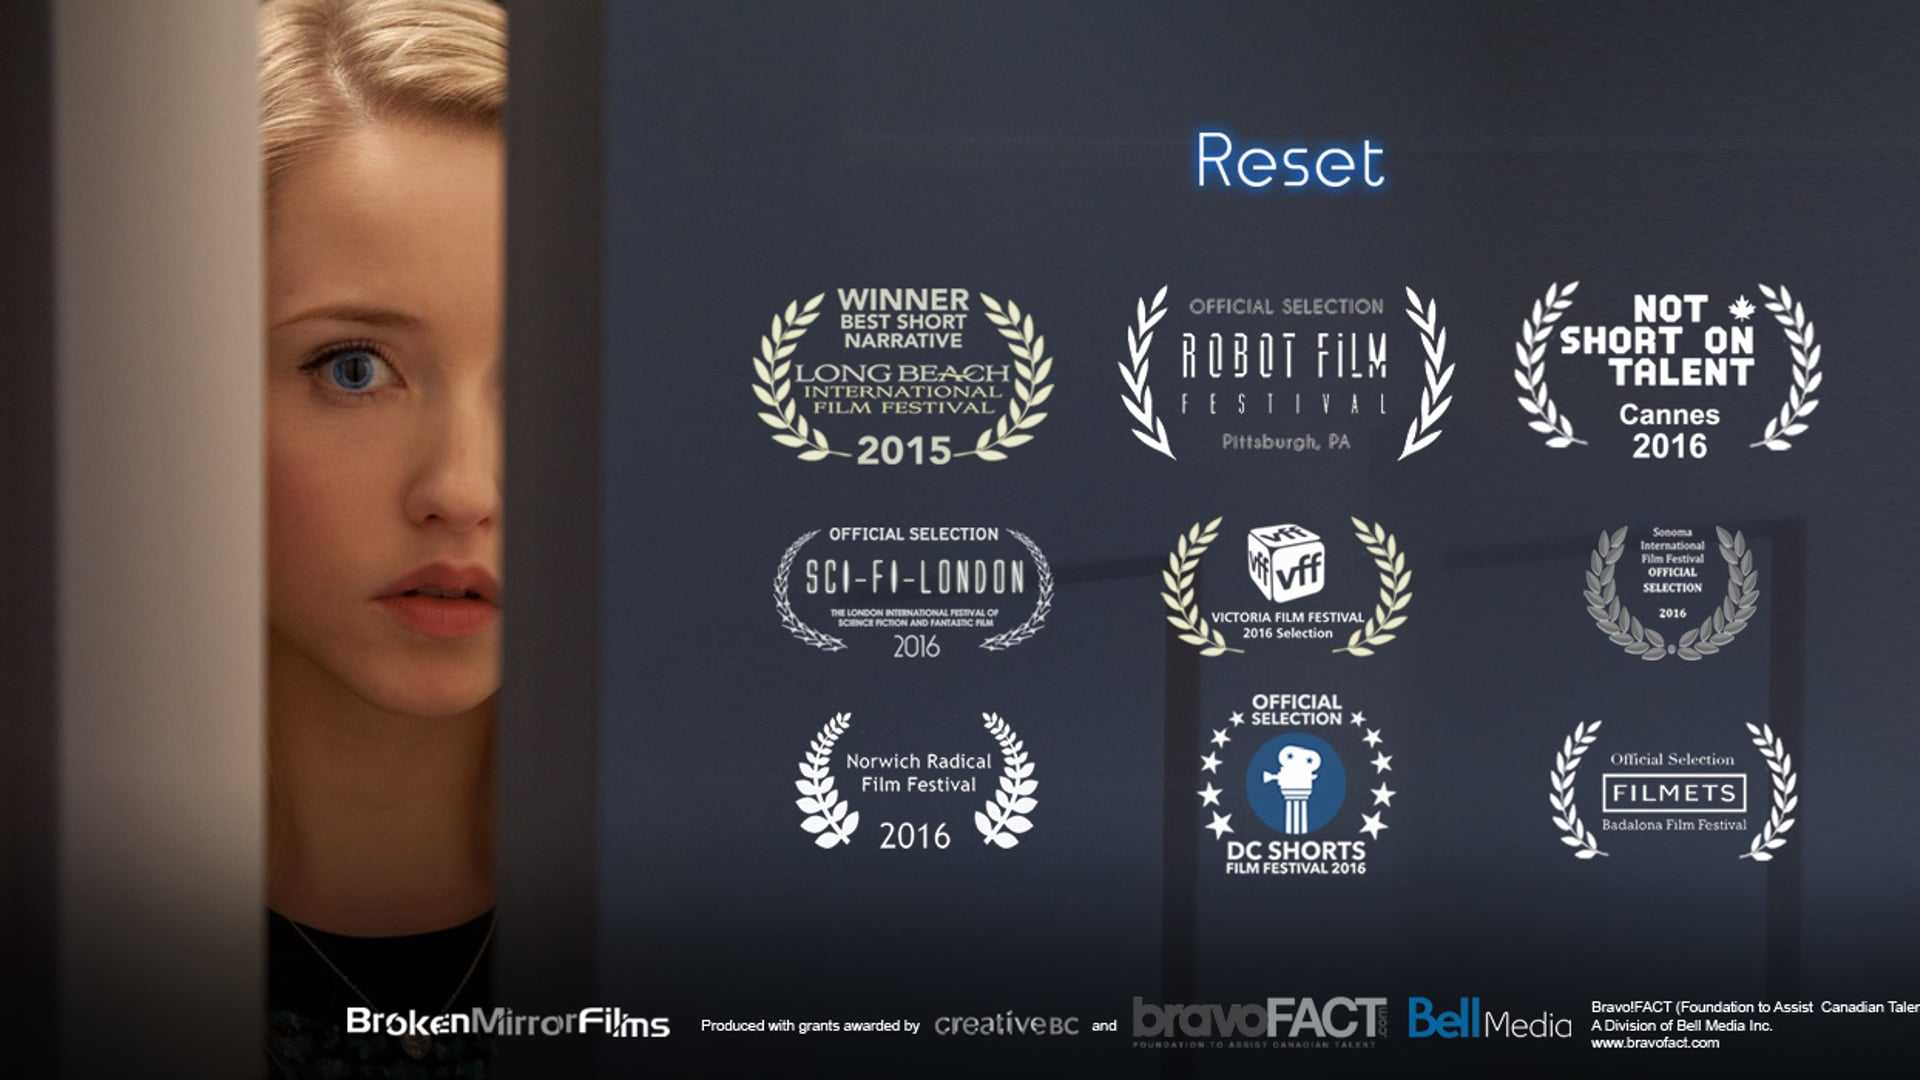 Reset Trailer